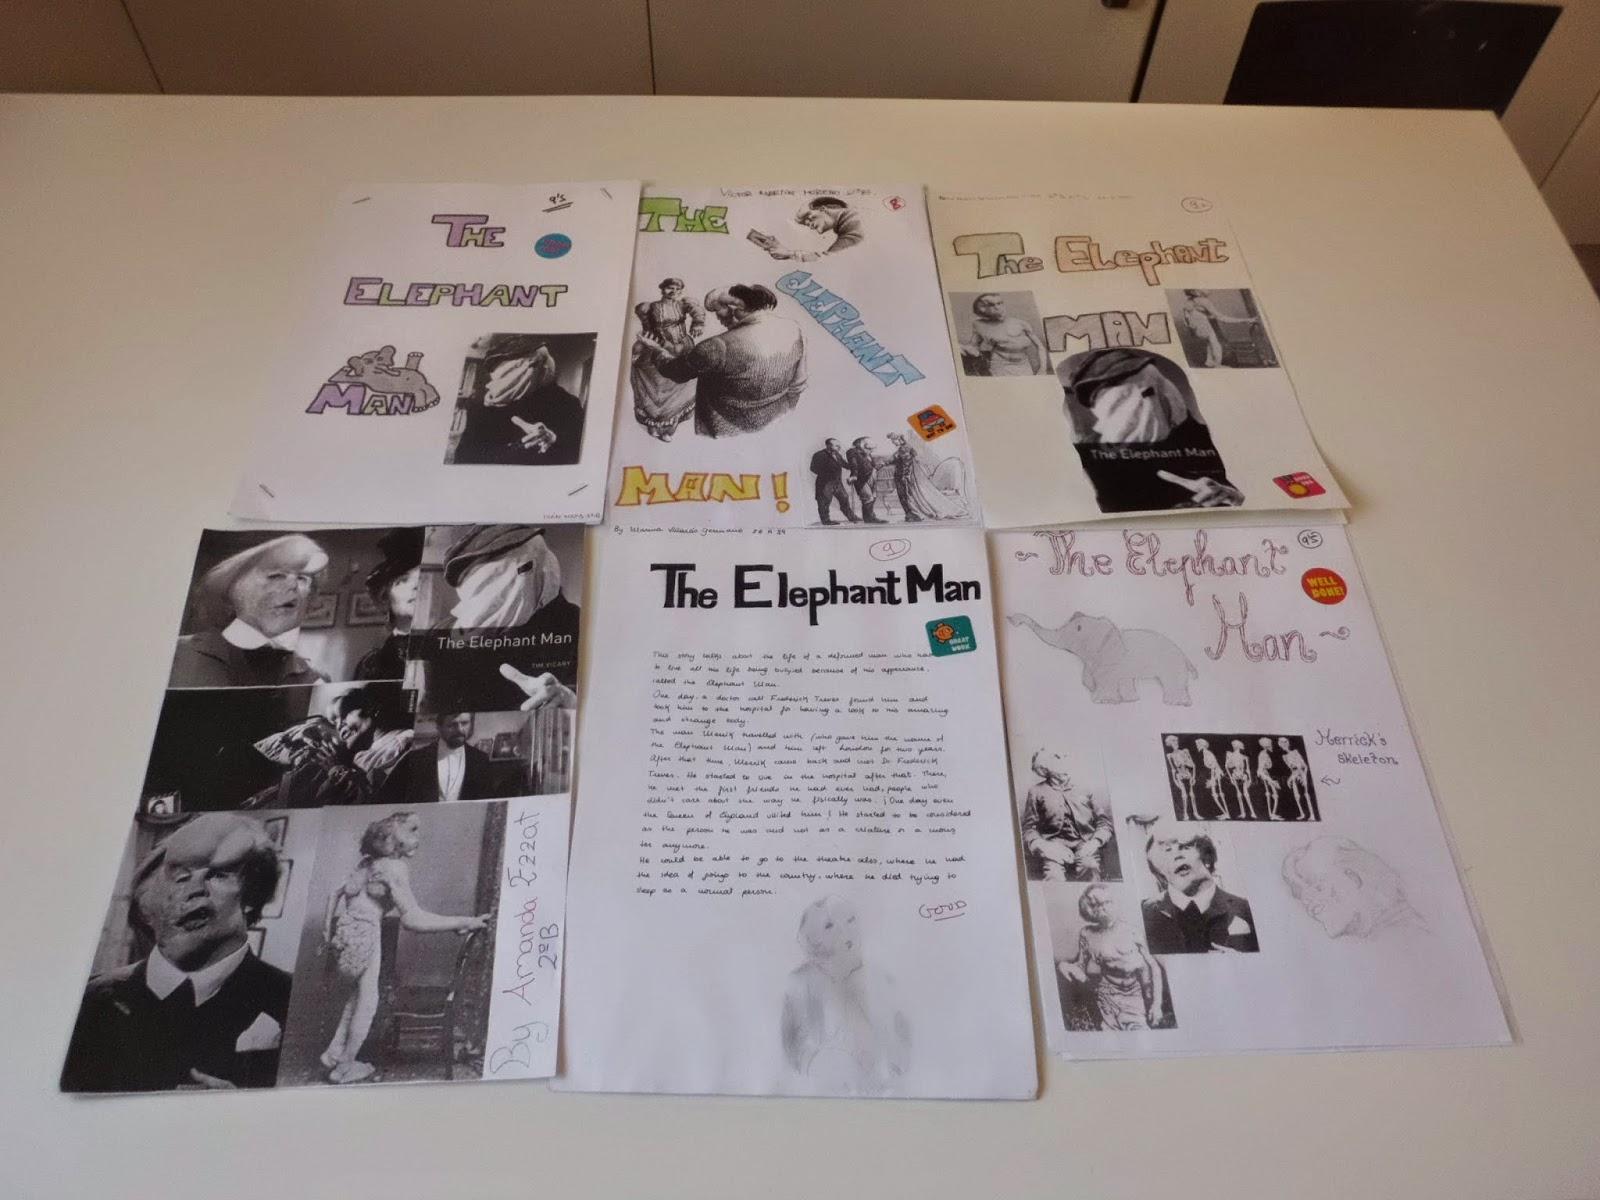 elephant man essay essay on the elephant biographical narrative  the elephant man essay character analysis essay writing help note an elephant rhetorical analysis in 1978